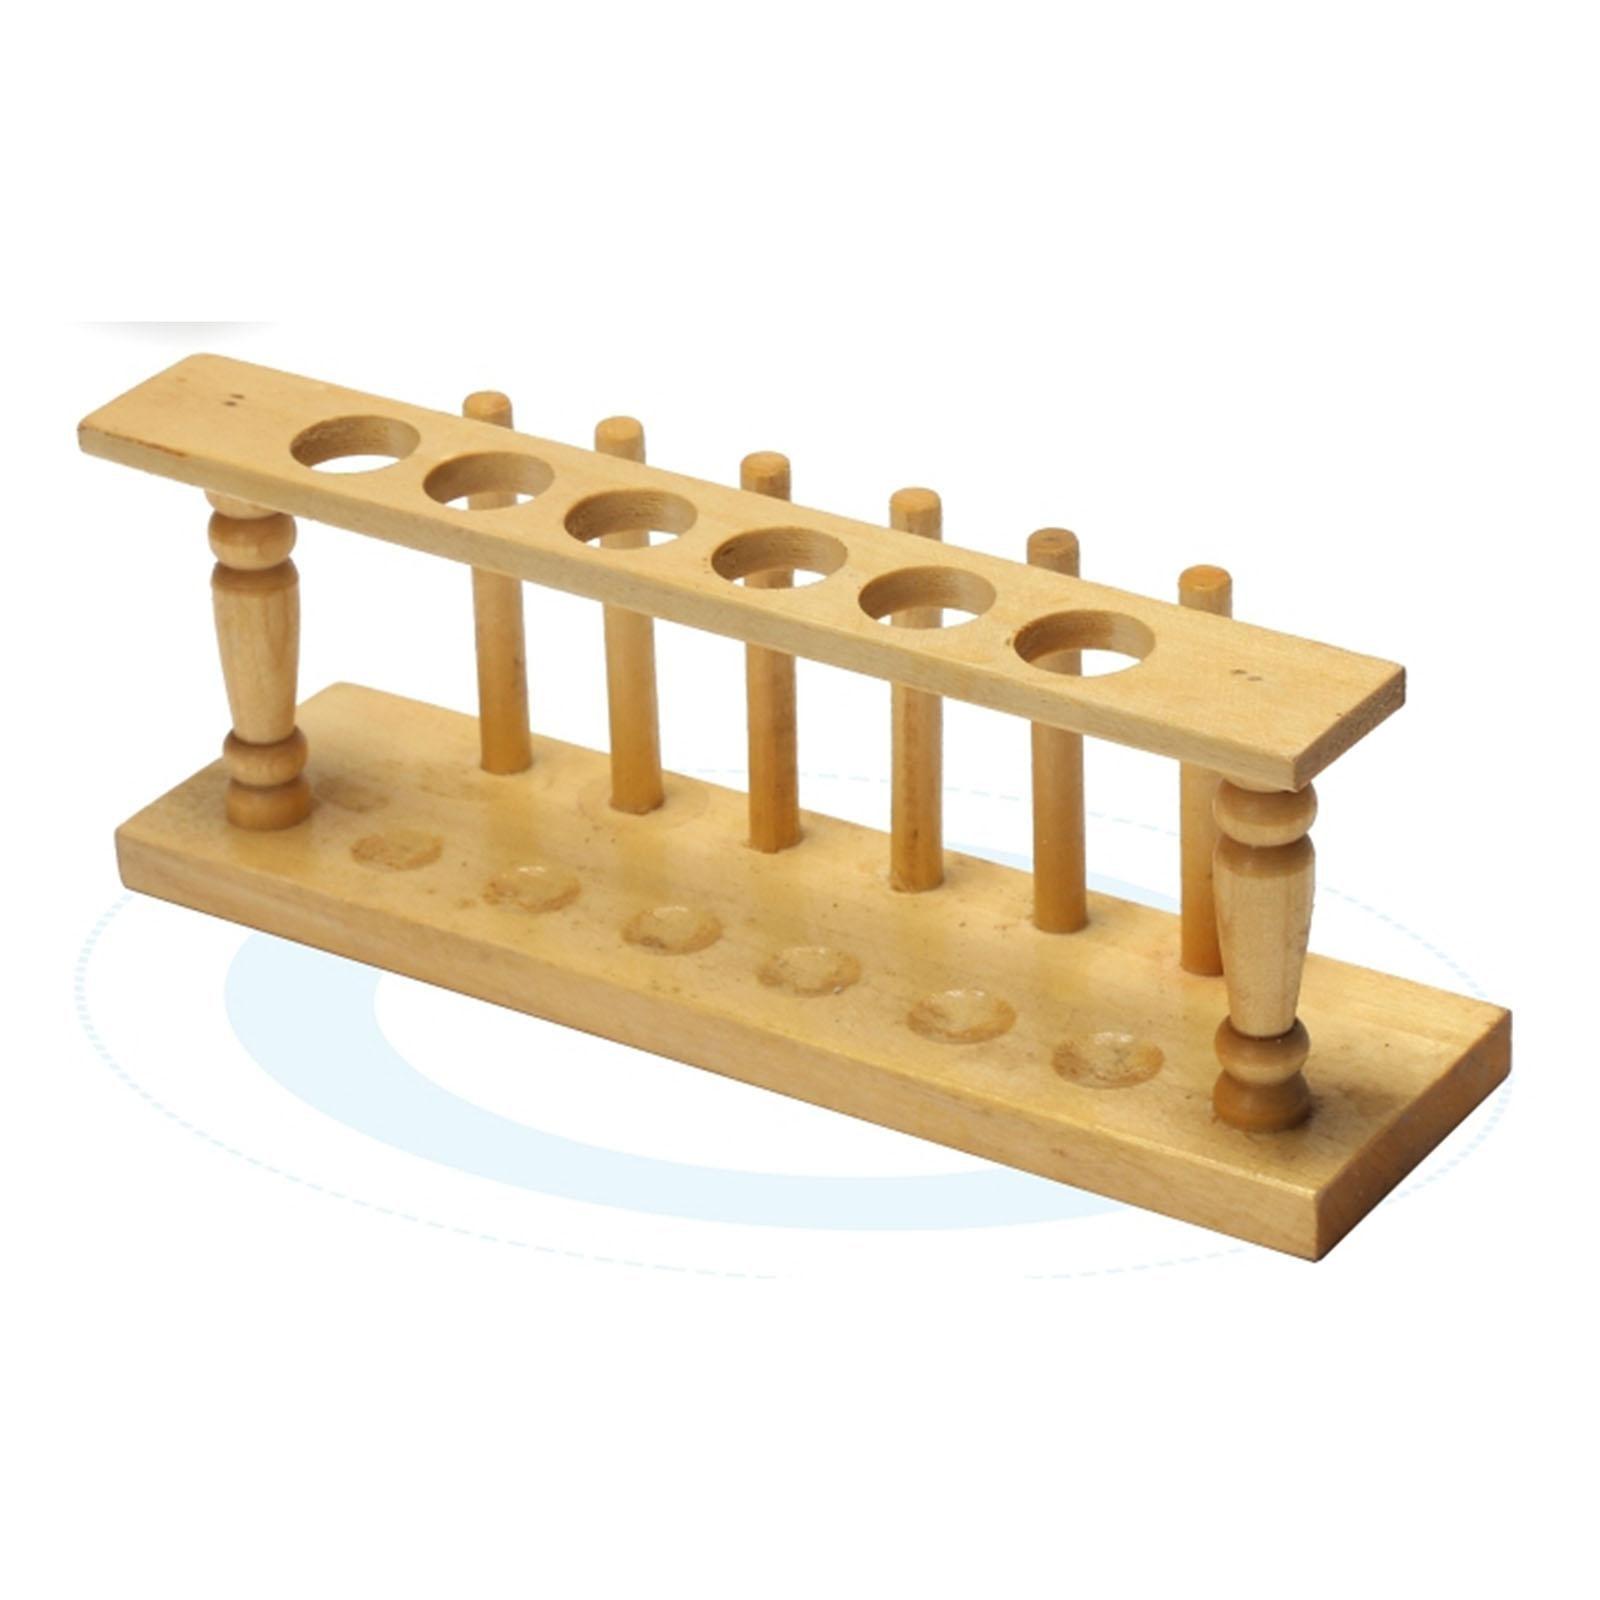 6 Holes 20mm Hole Diameter Lab Wooden Test Tube Storage Holder Bracket Rack With Stand Sticks